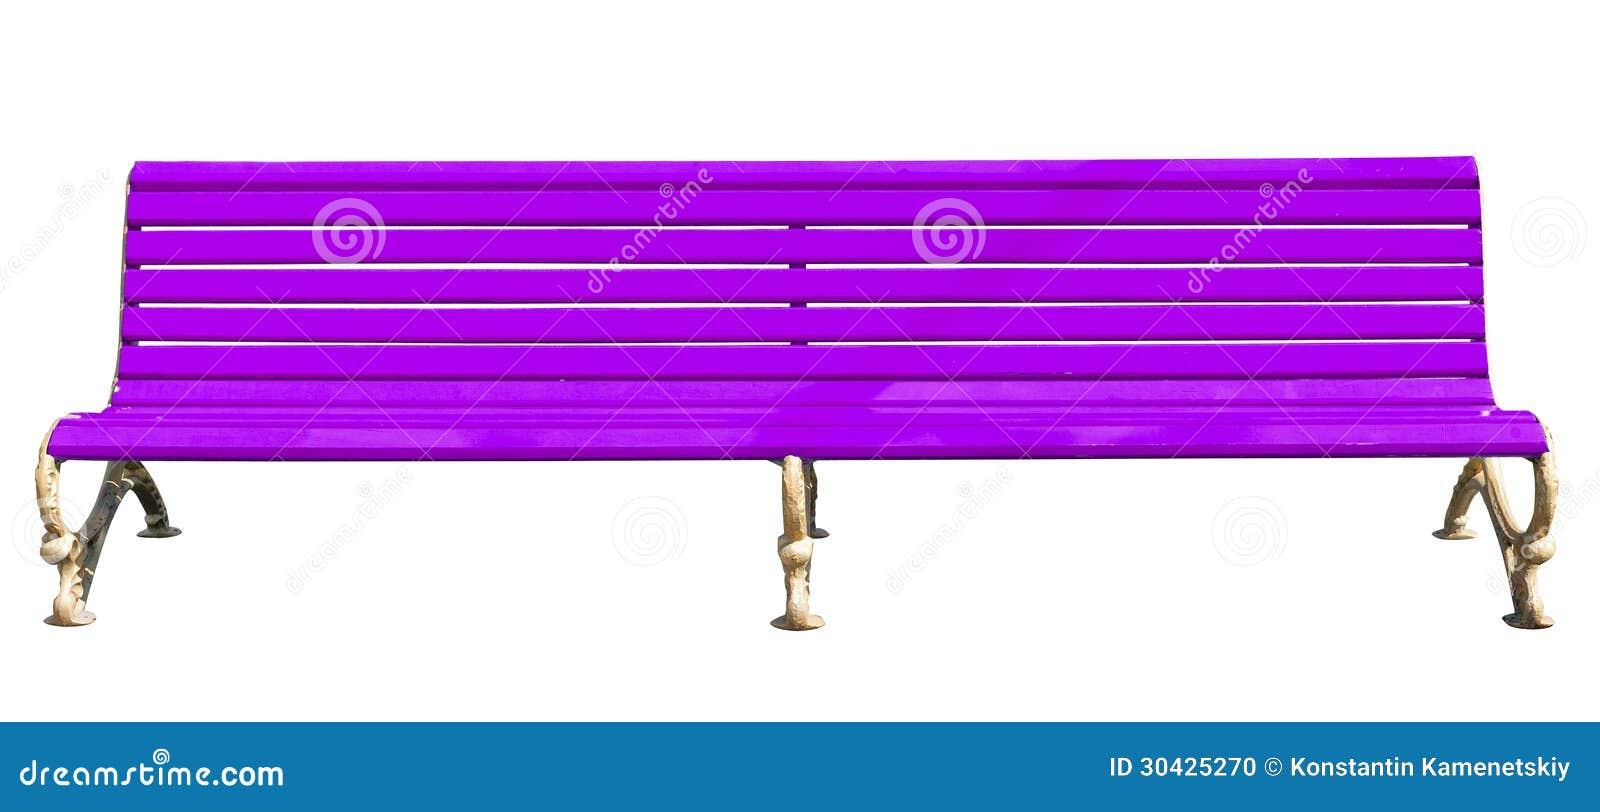 seating modular furniture bench catpvayu nera back s with arm and left purple soft single bla dams